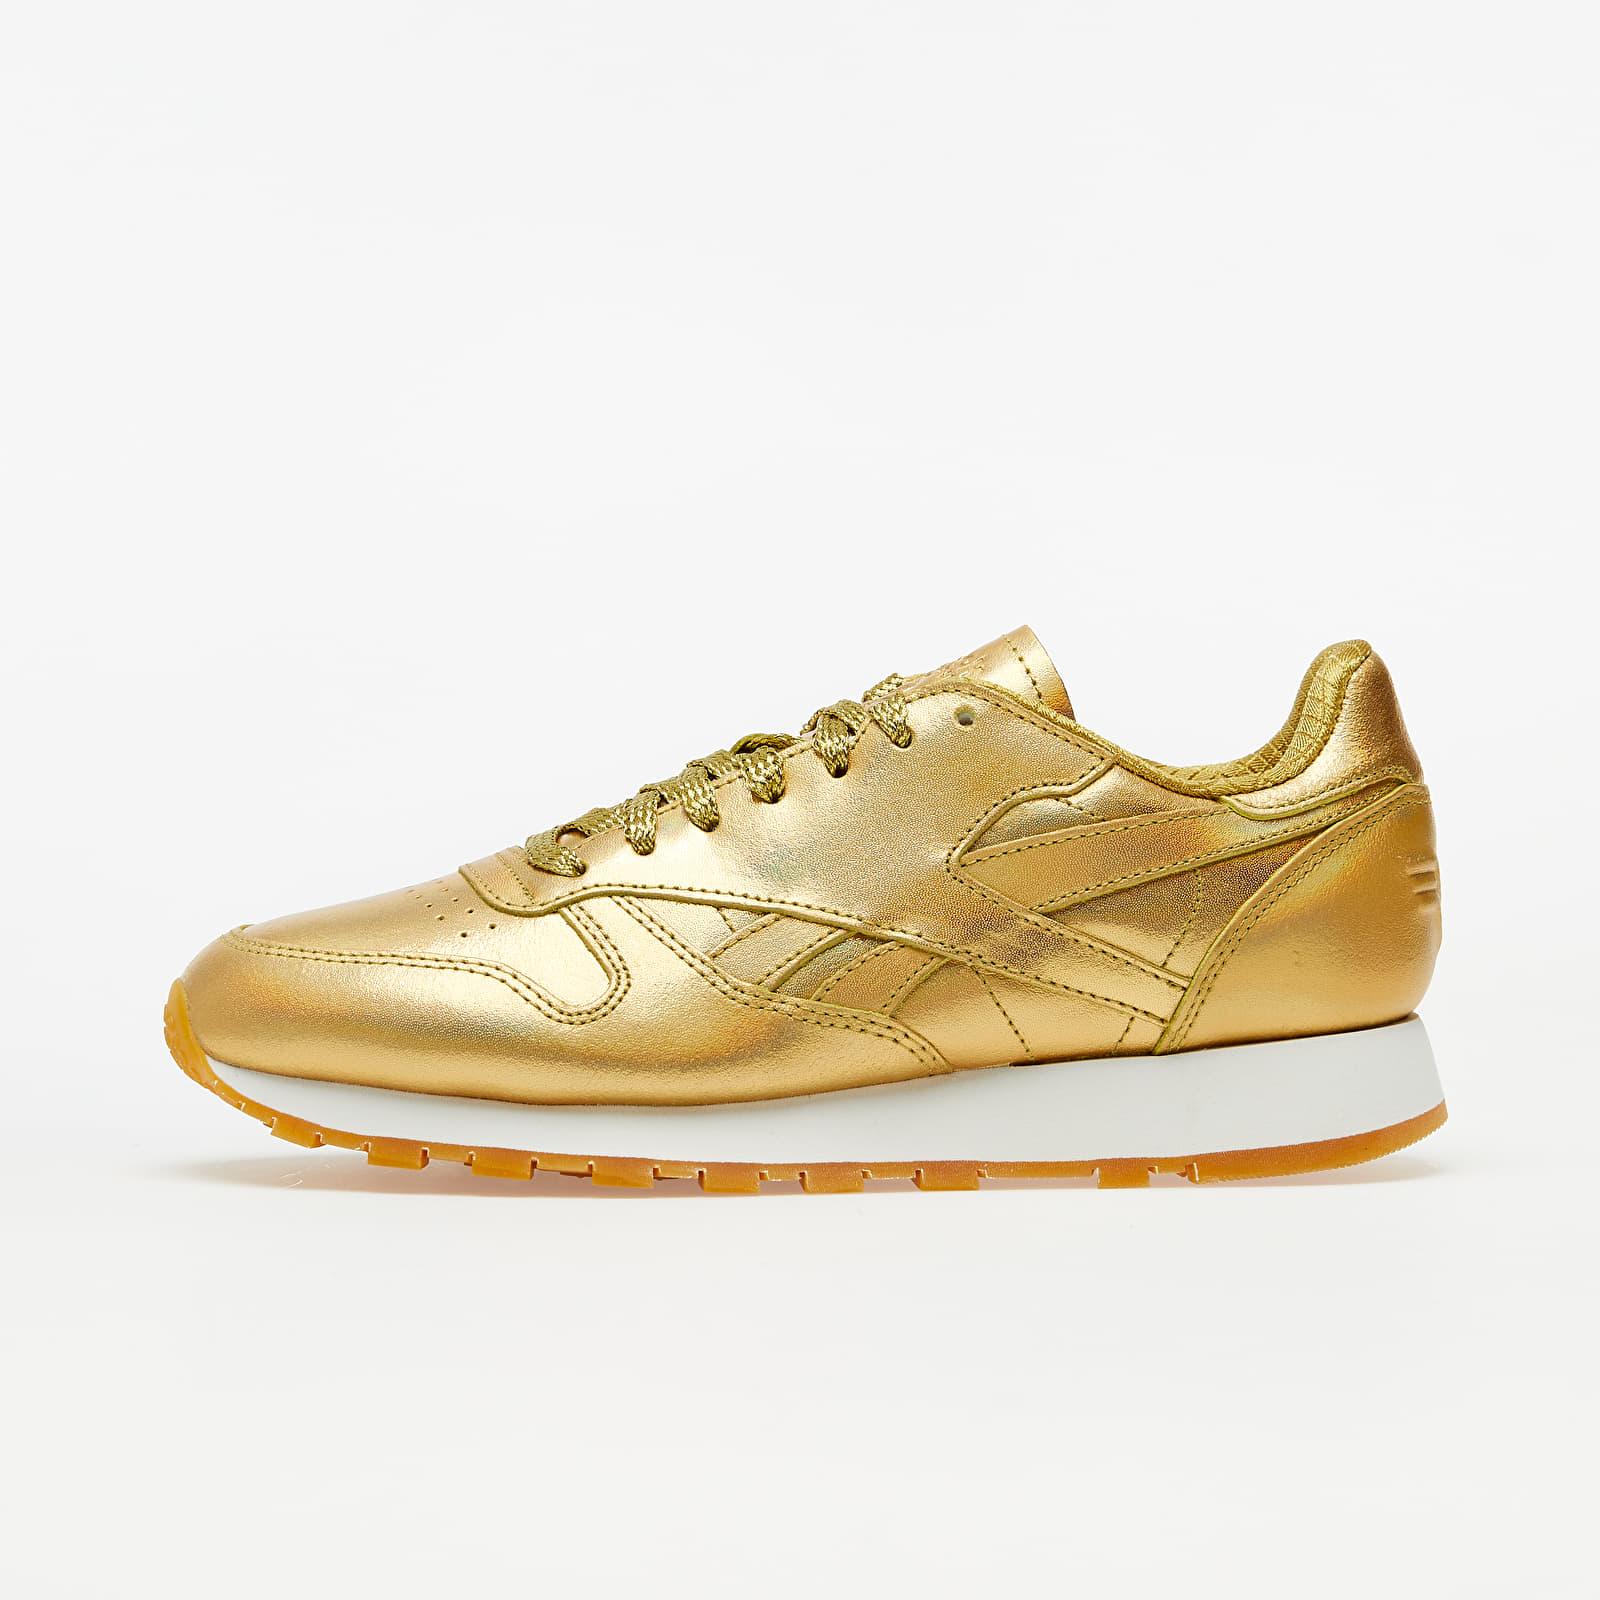 Pánské tenisky a boty Reebok x Wonder Woman Classic Leather MU Gold Metalic/ Gold Metalic/ Gold Metalic